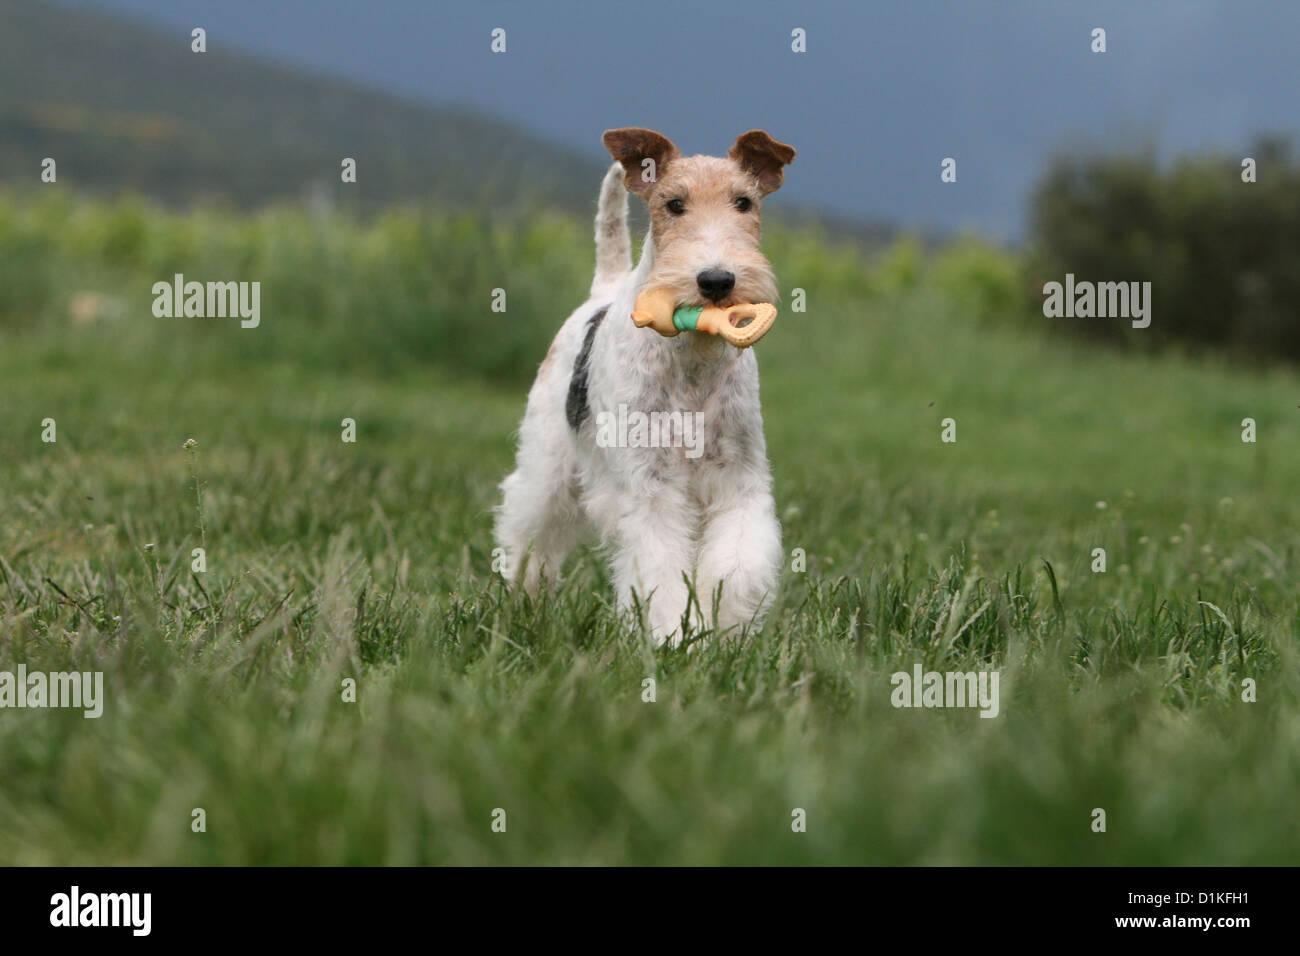 Toy Fox Terrier Stockfotos & Toy Fox Terrier Bilder - Alamy